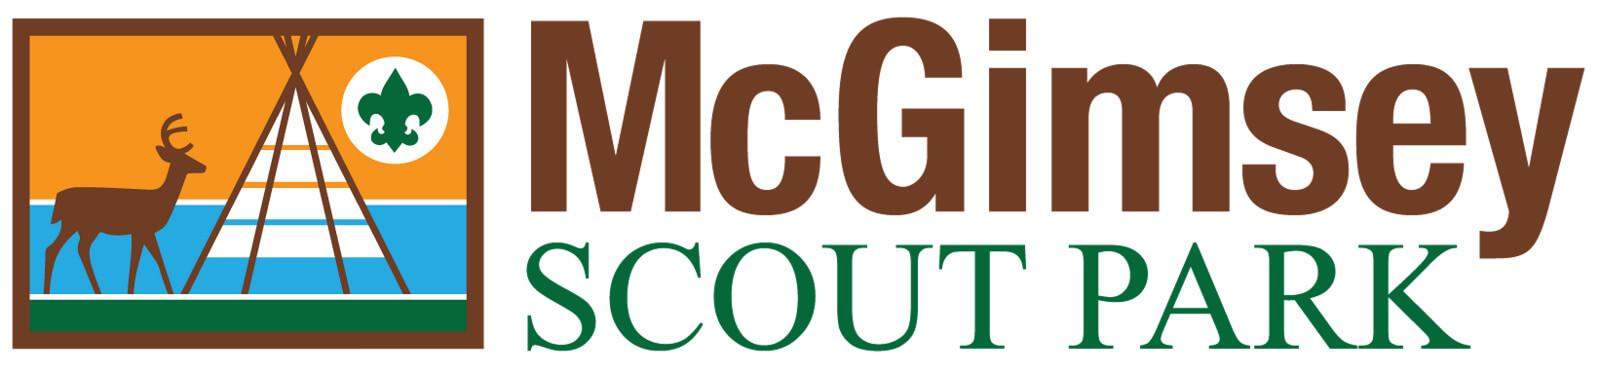 mcgimsey-scout-park-banner